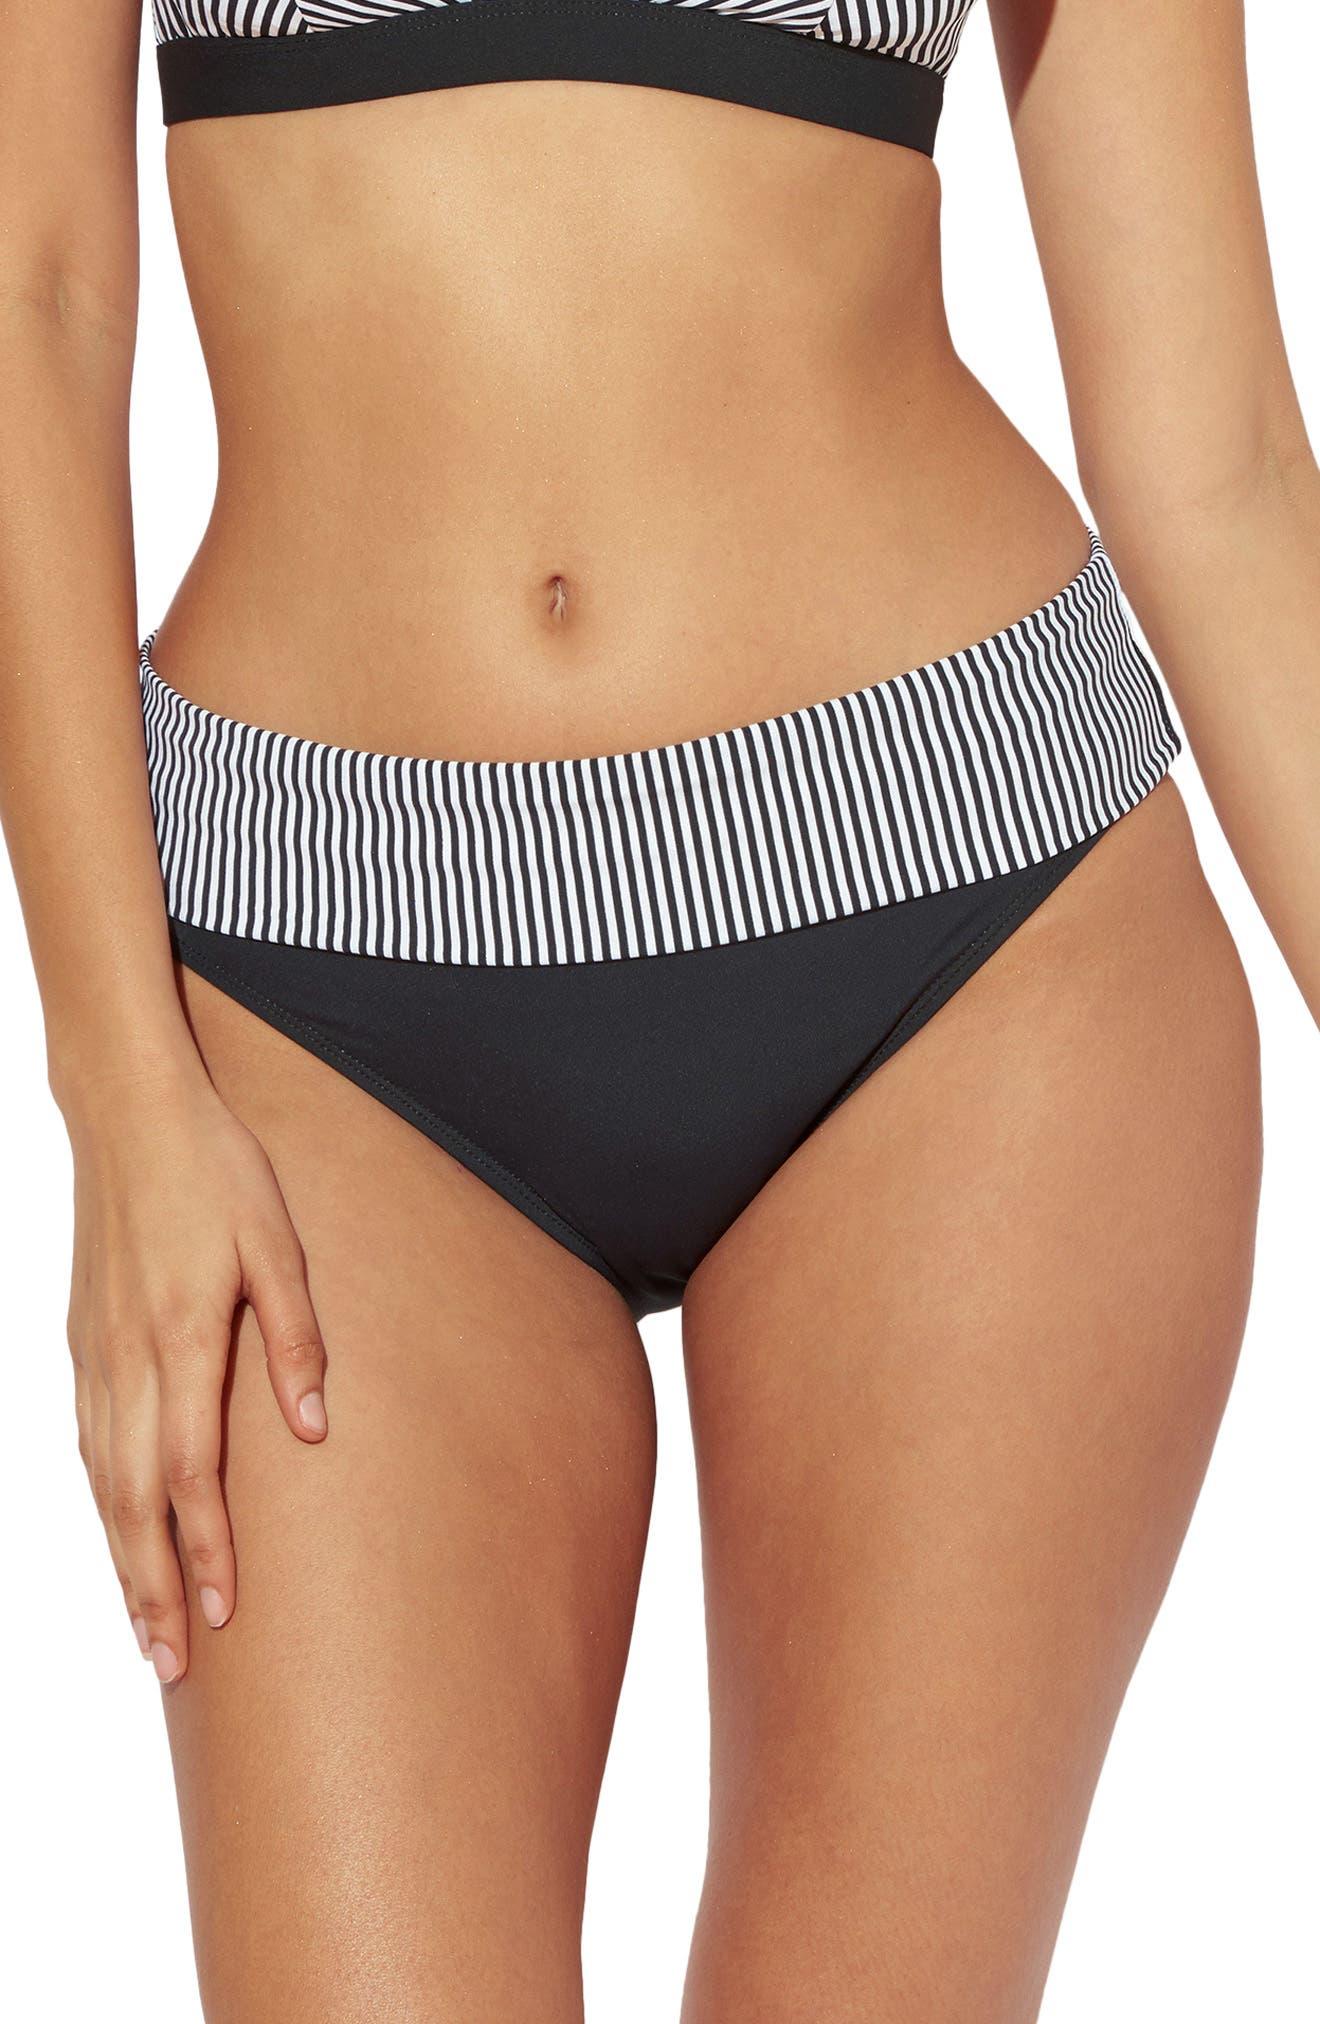 Inside The Lines Bikini Bottoms